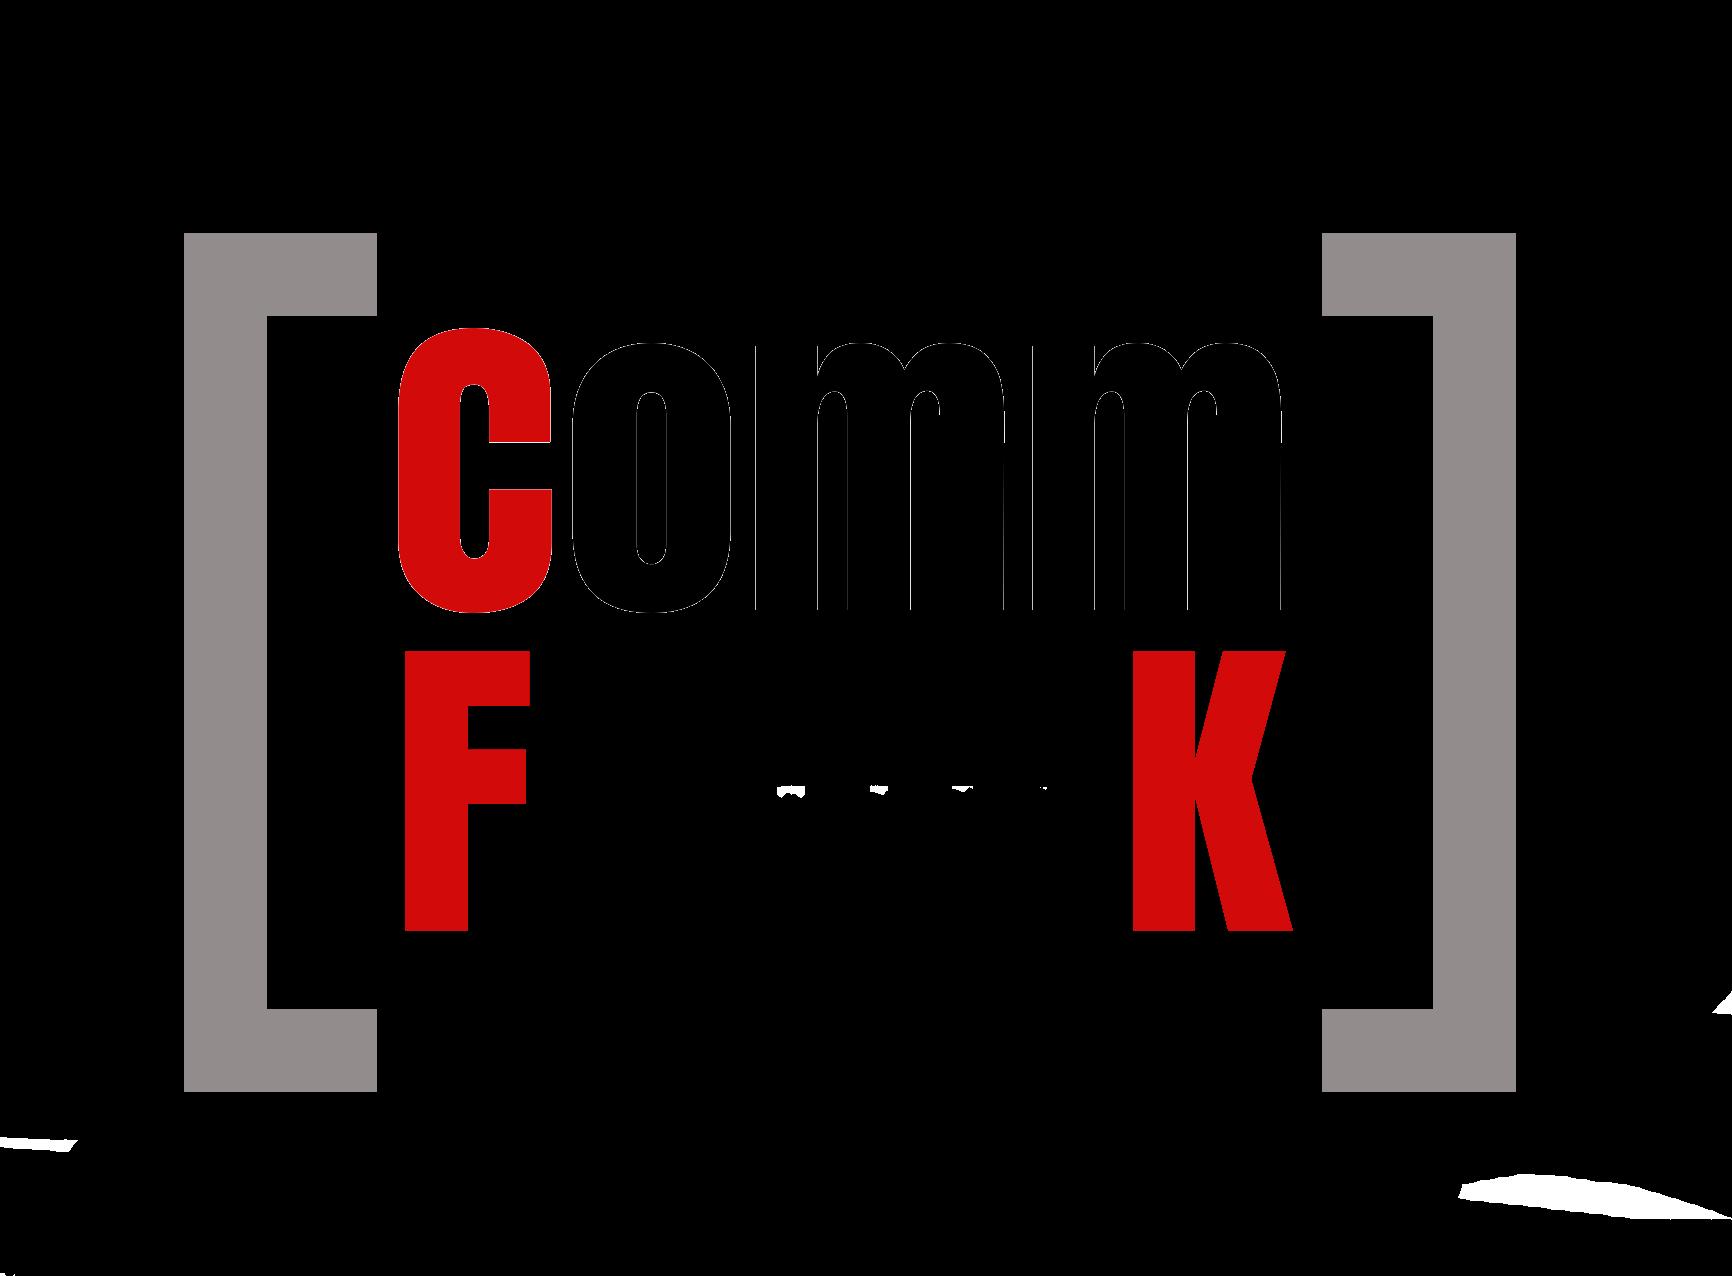 CommFabriK